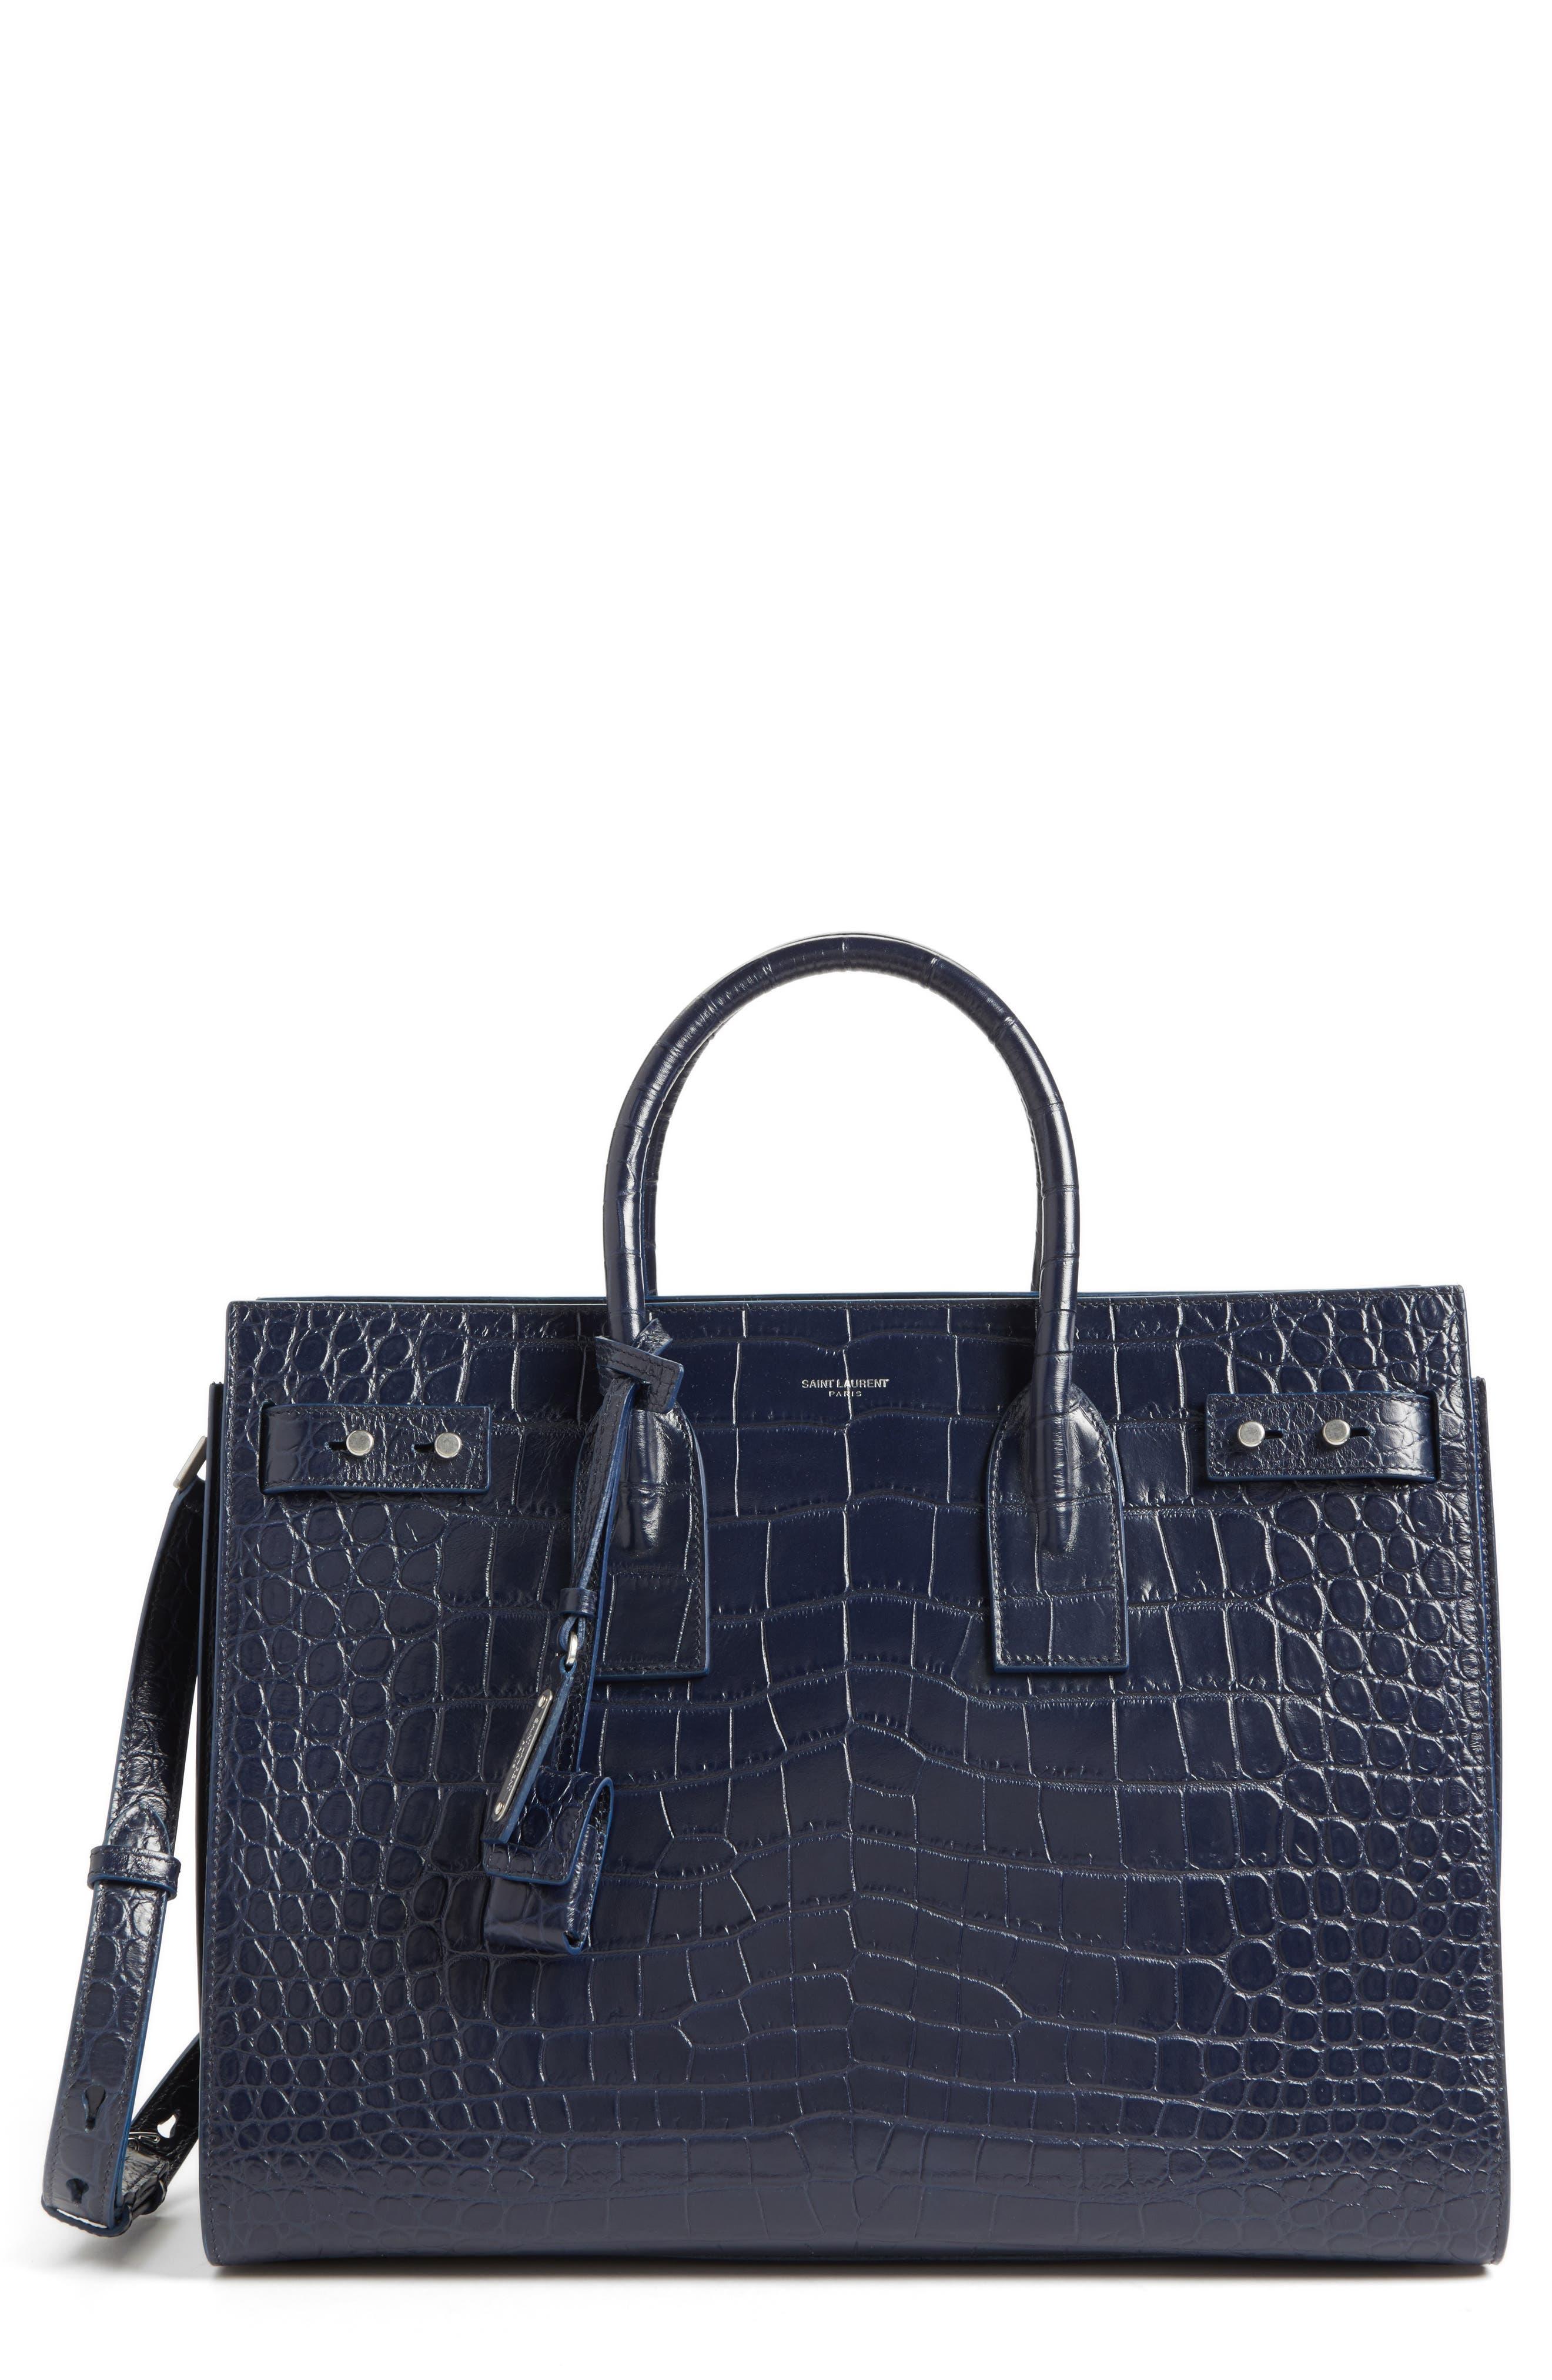 Small Sac de Jour Croc Embossed Leather Tote,                         Main,                         color, Bleu Fonce